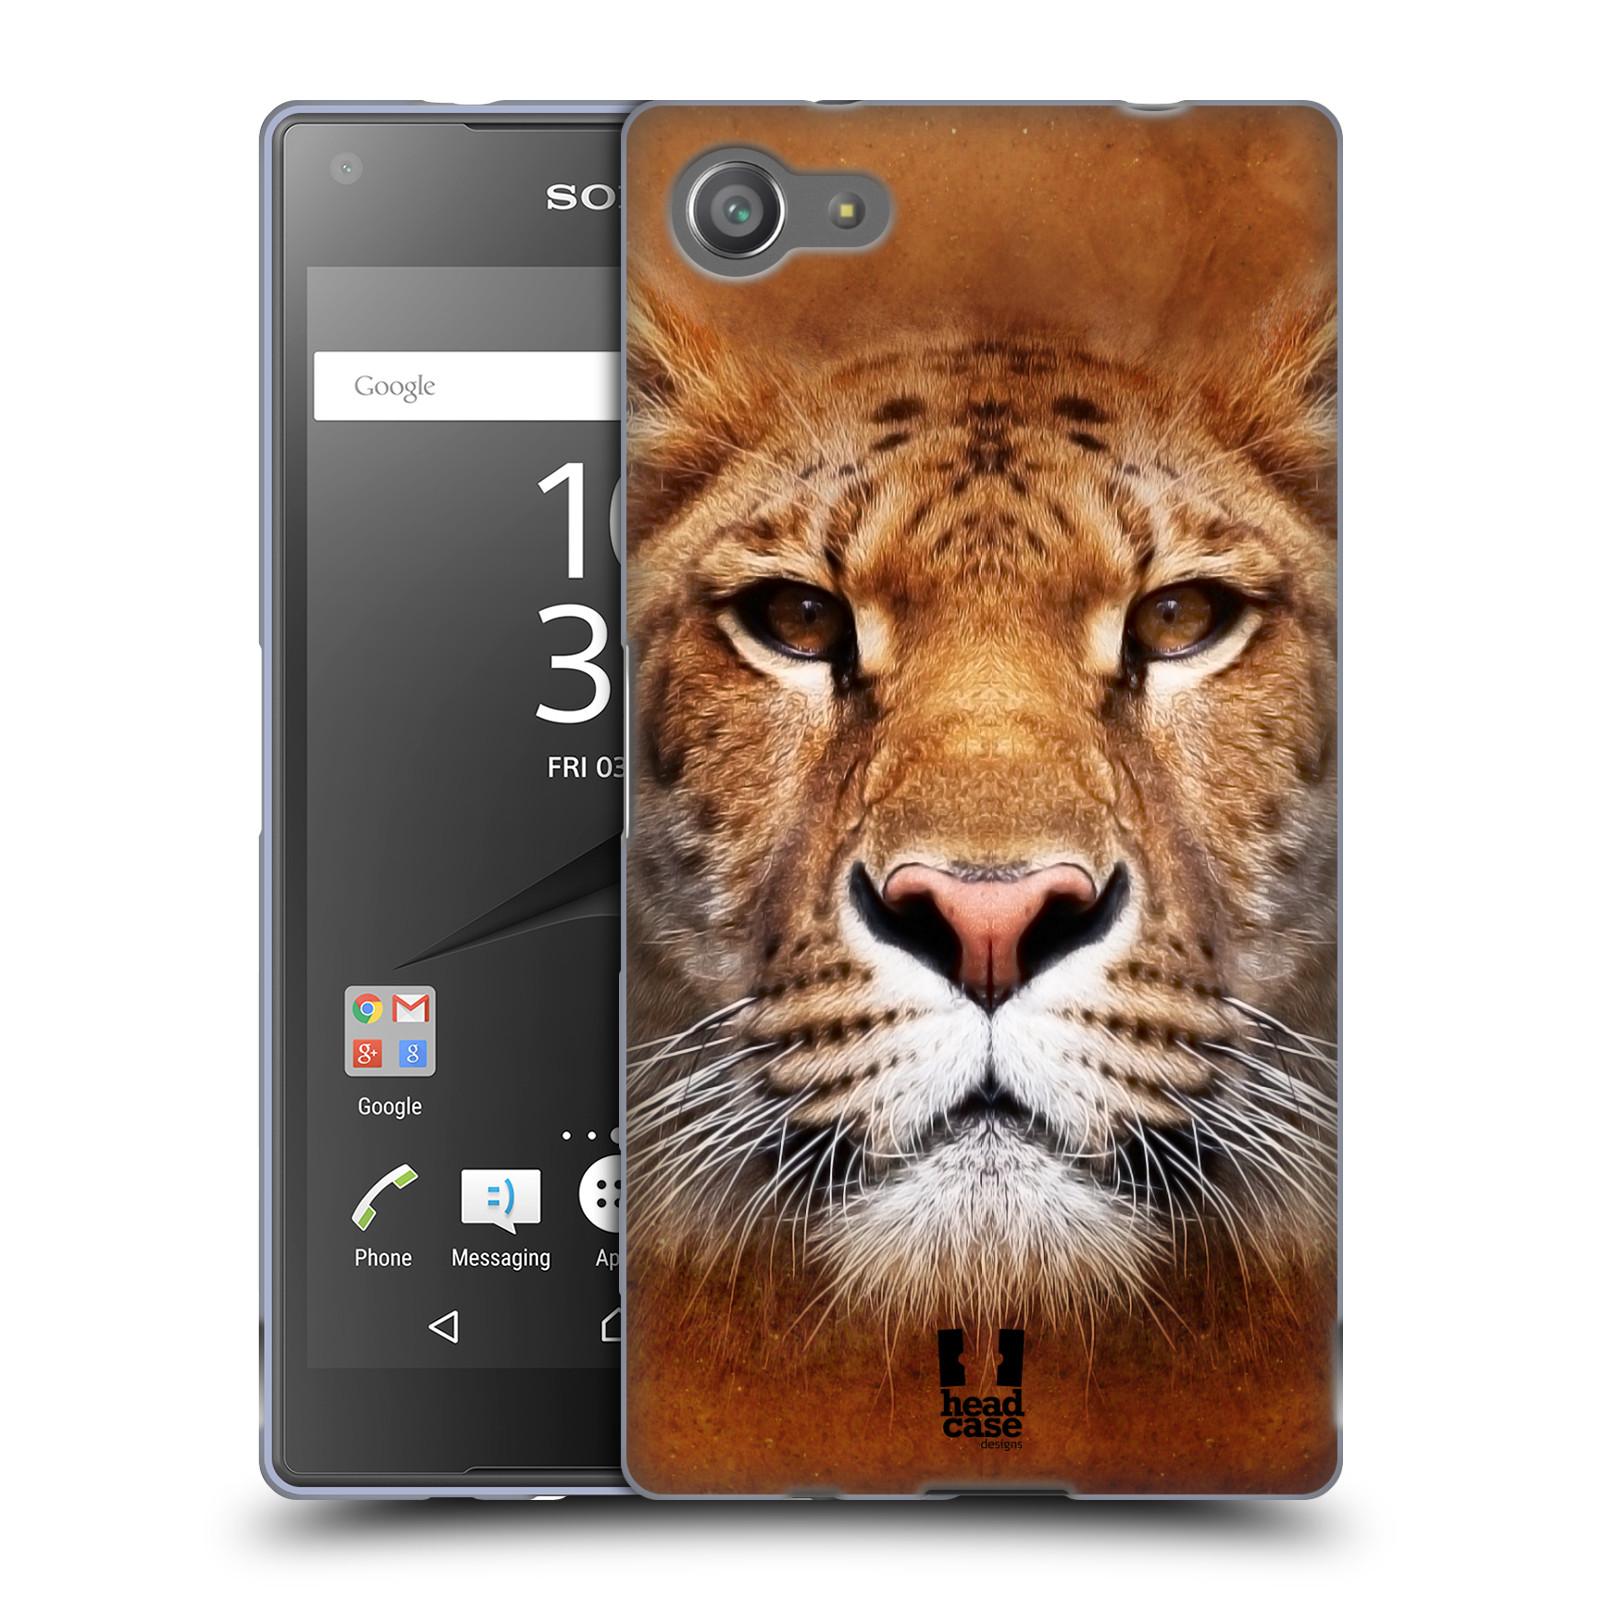 HEAD CASE silikonový obal na mobil Sony Xperia Z5 COMPACT vzor Zvířecí tváře Sibiřský tygr